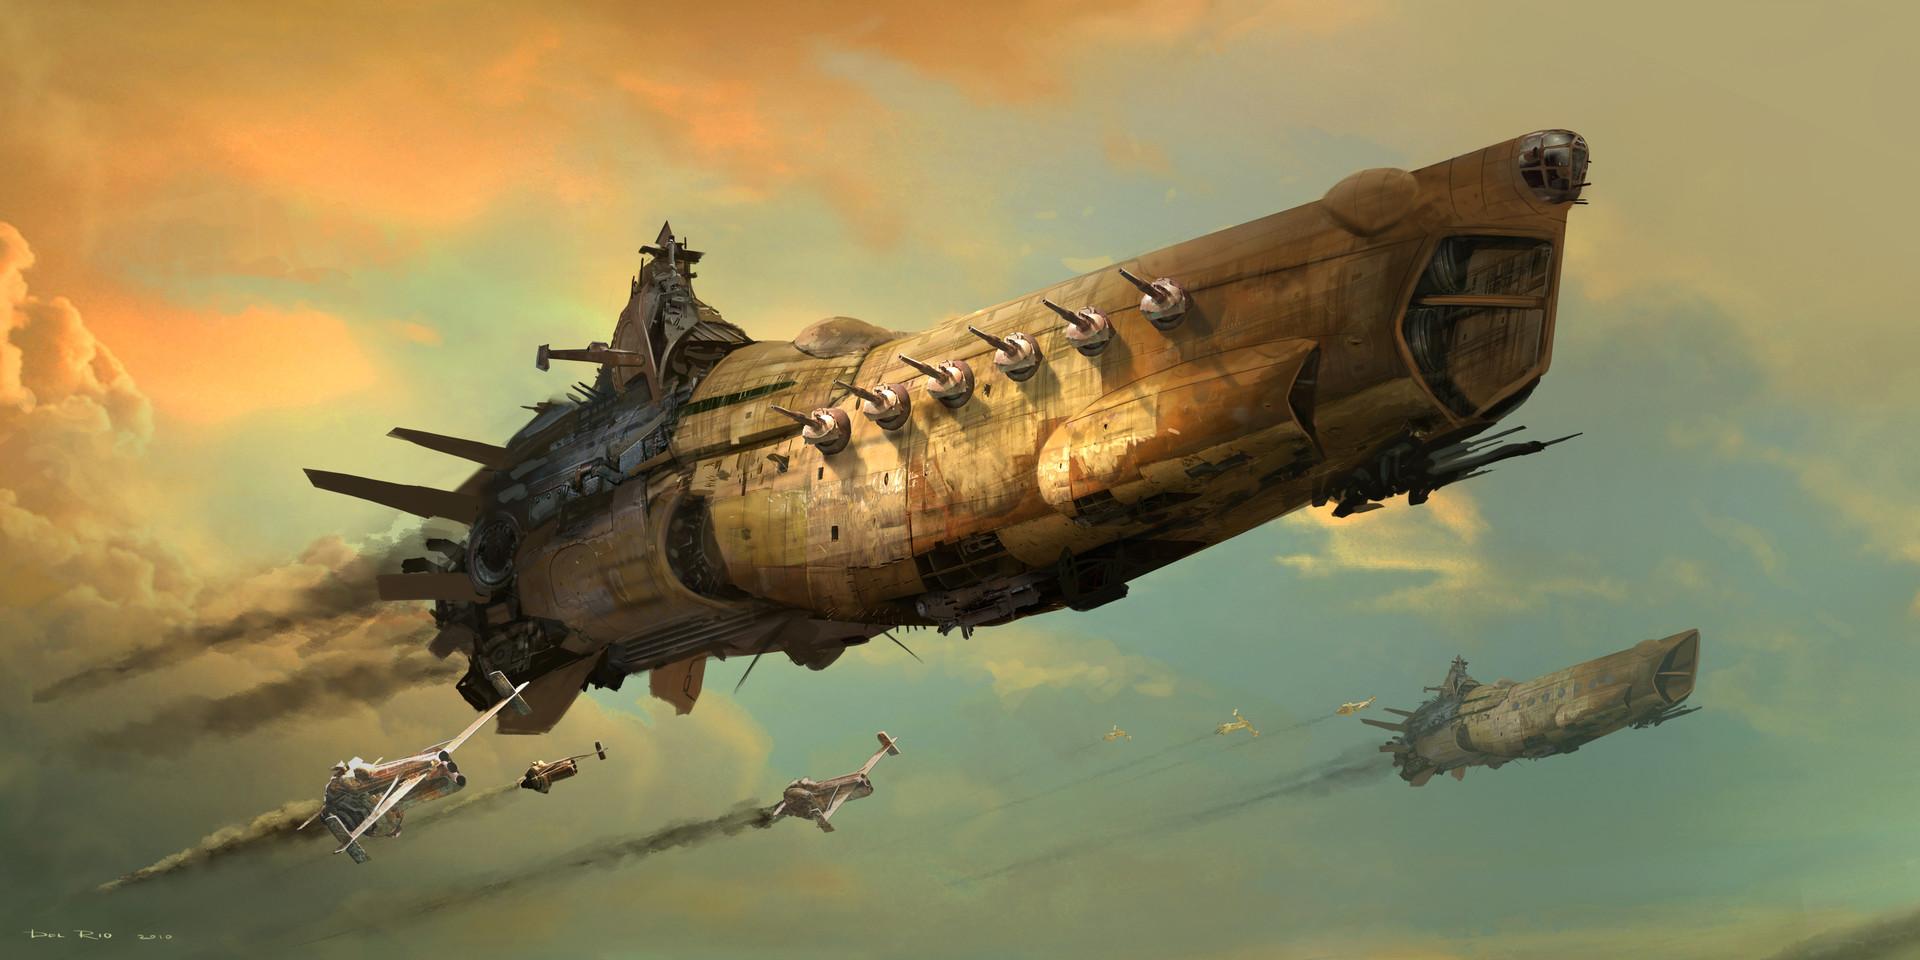 Artstation - Robota Battleship Eddie Del Rio